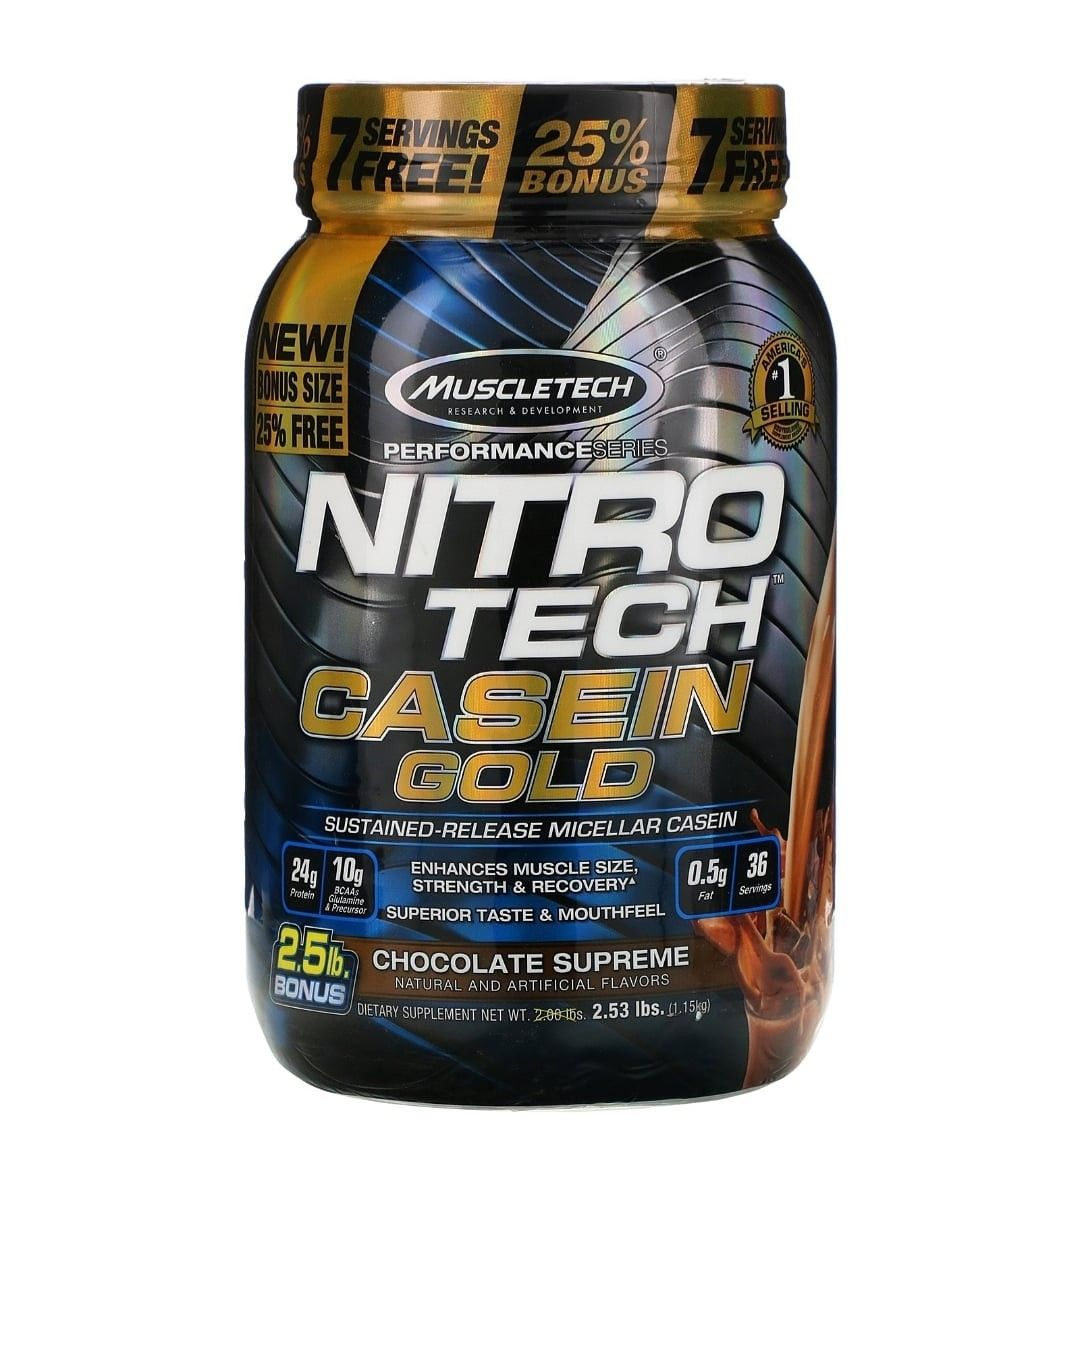 Muscletech Nitro Tech Casein Gold فانيليا كريمية 2 50 رطل 1 13 كجم Discontinued Item Nitro Tech Muscletech Nutrition Branding